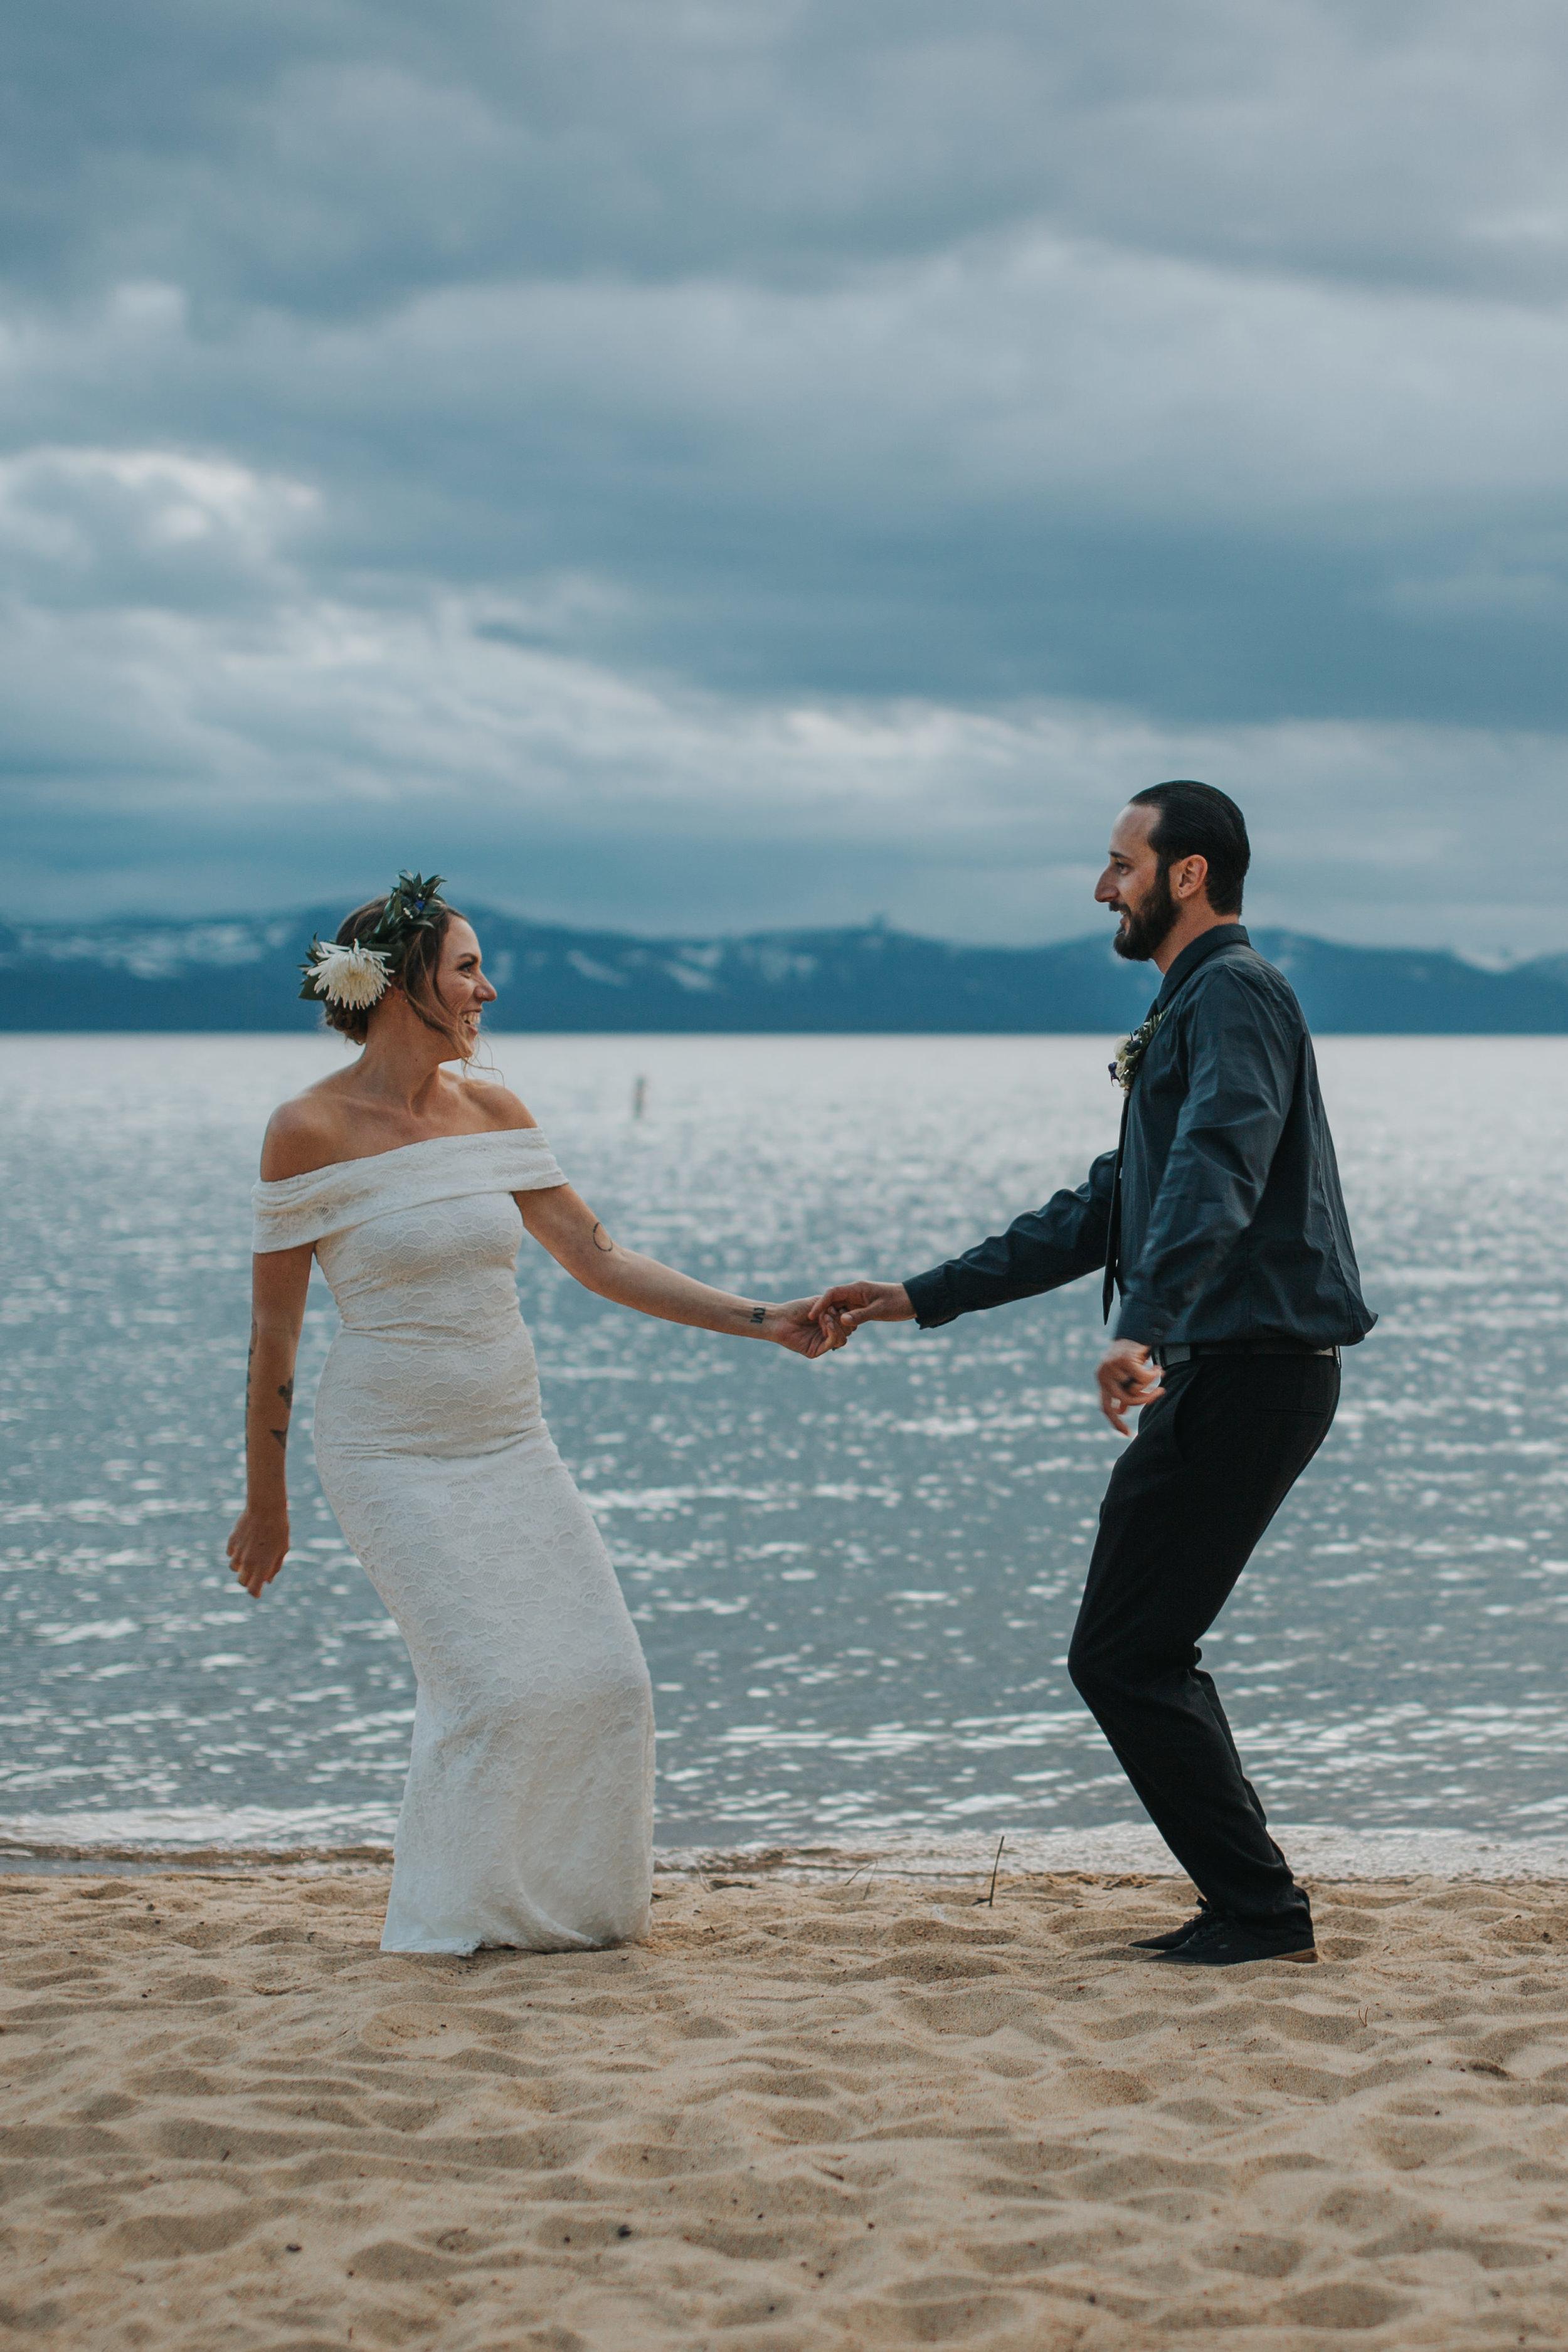 south-lake-tahoe-elopement-valerie-lendvay-photo-057.jpg